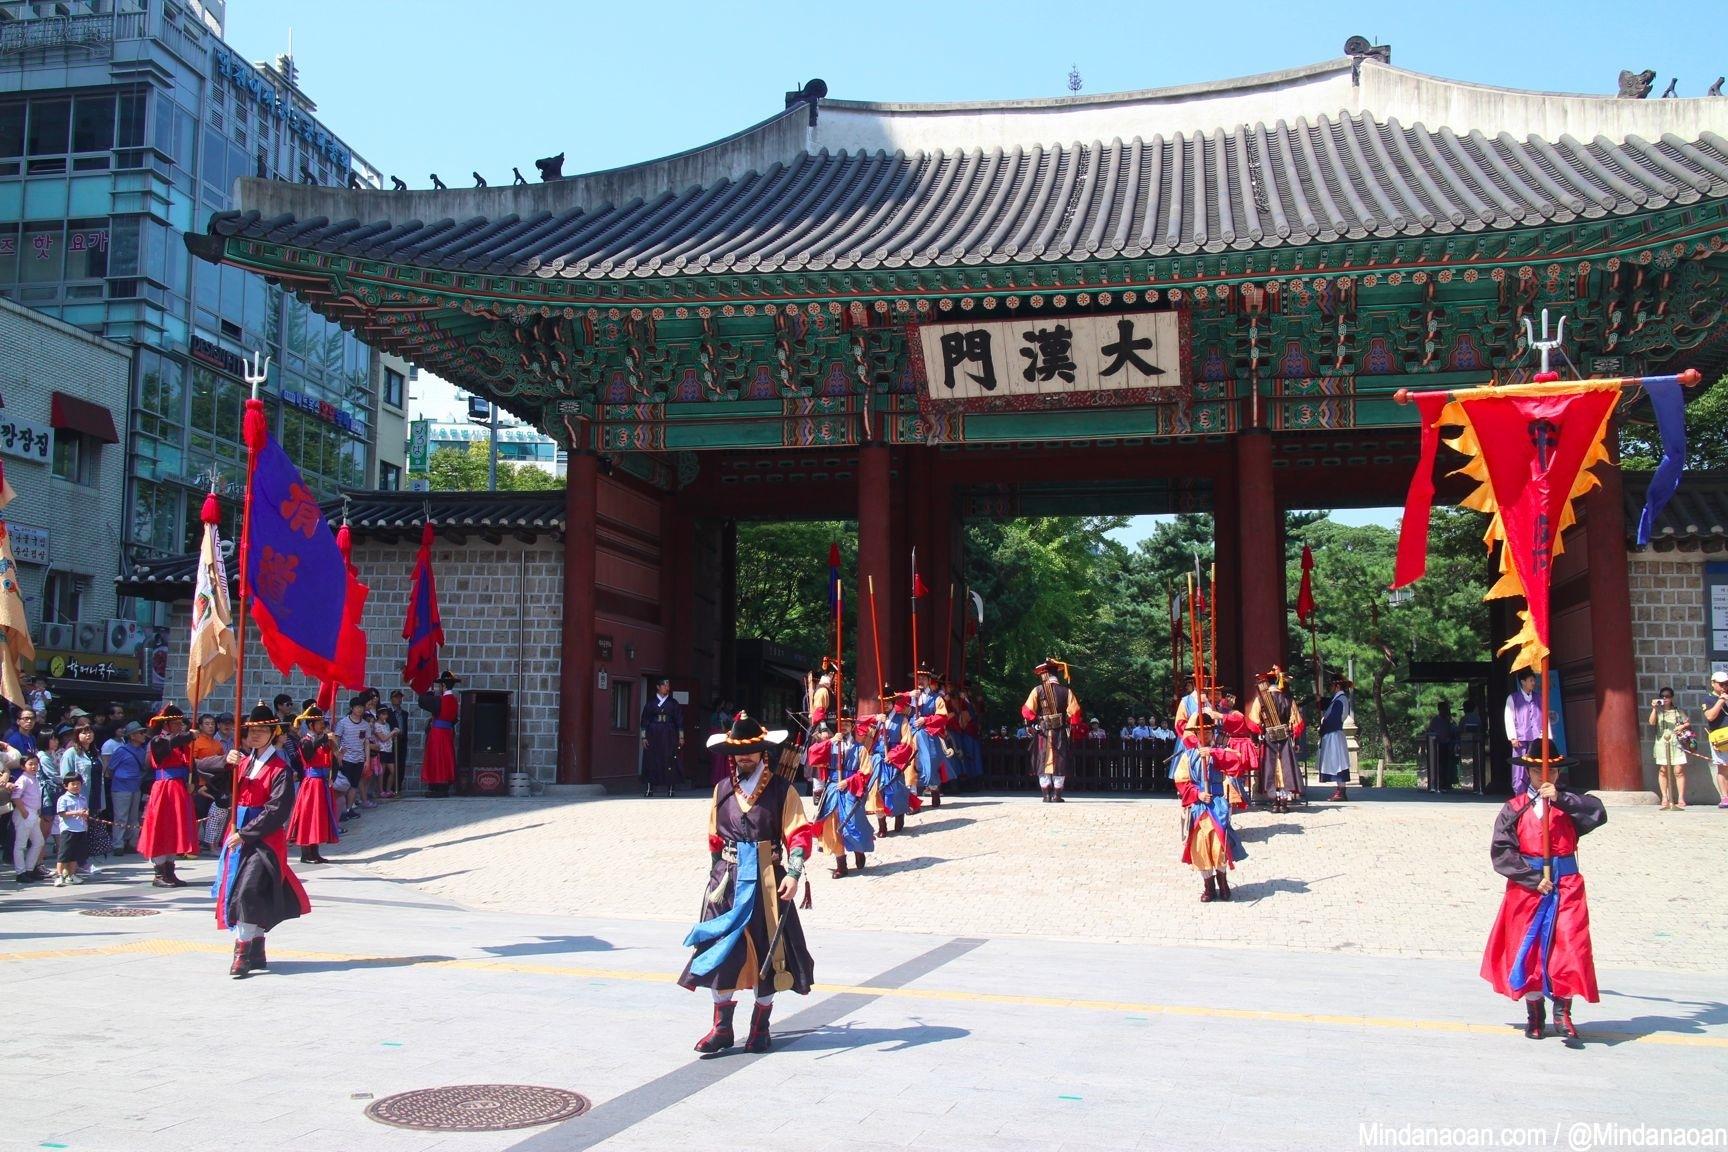 Mindanaoan In Korea travel series: Deoksugung Palace changing of guards